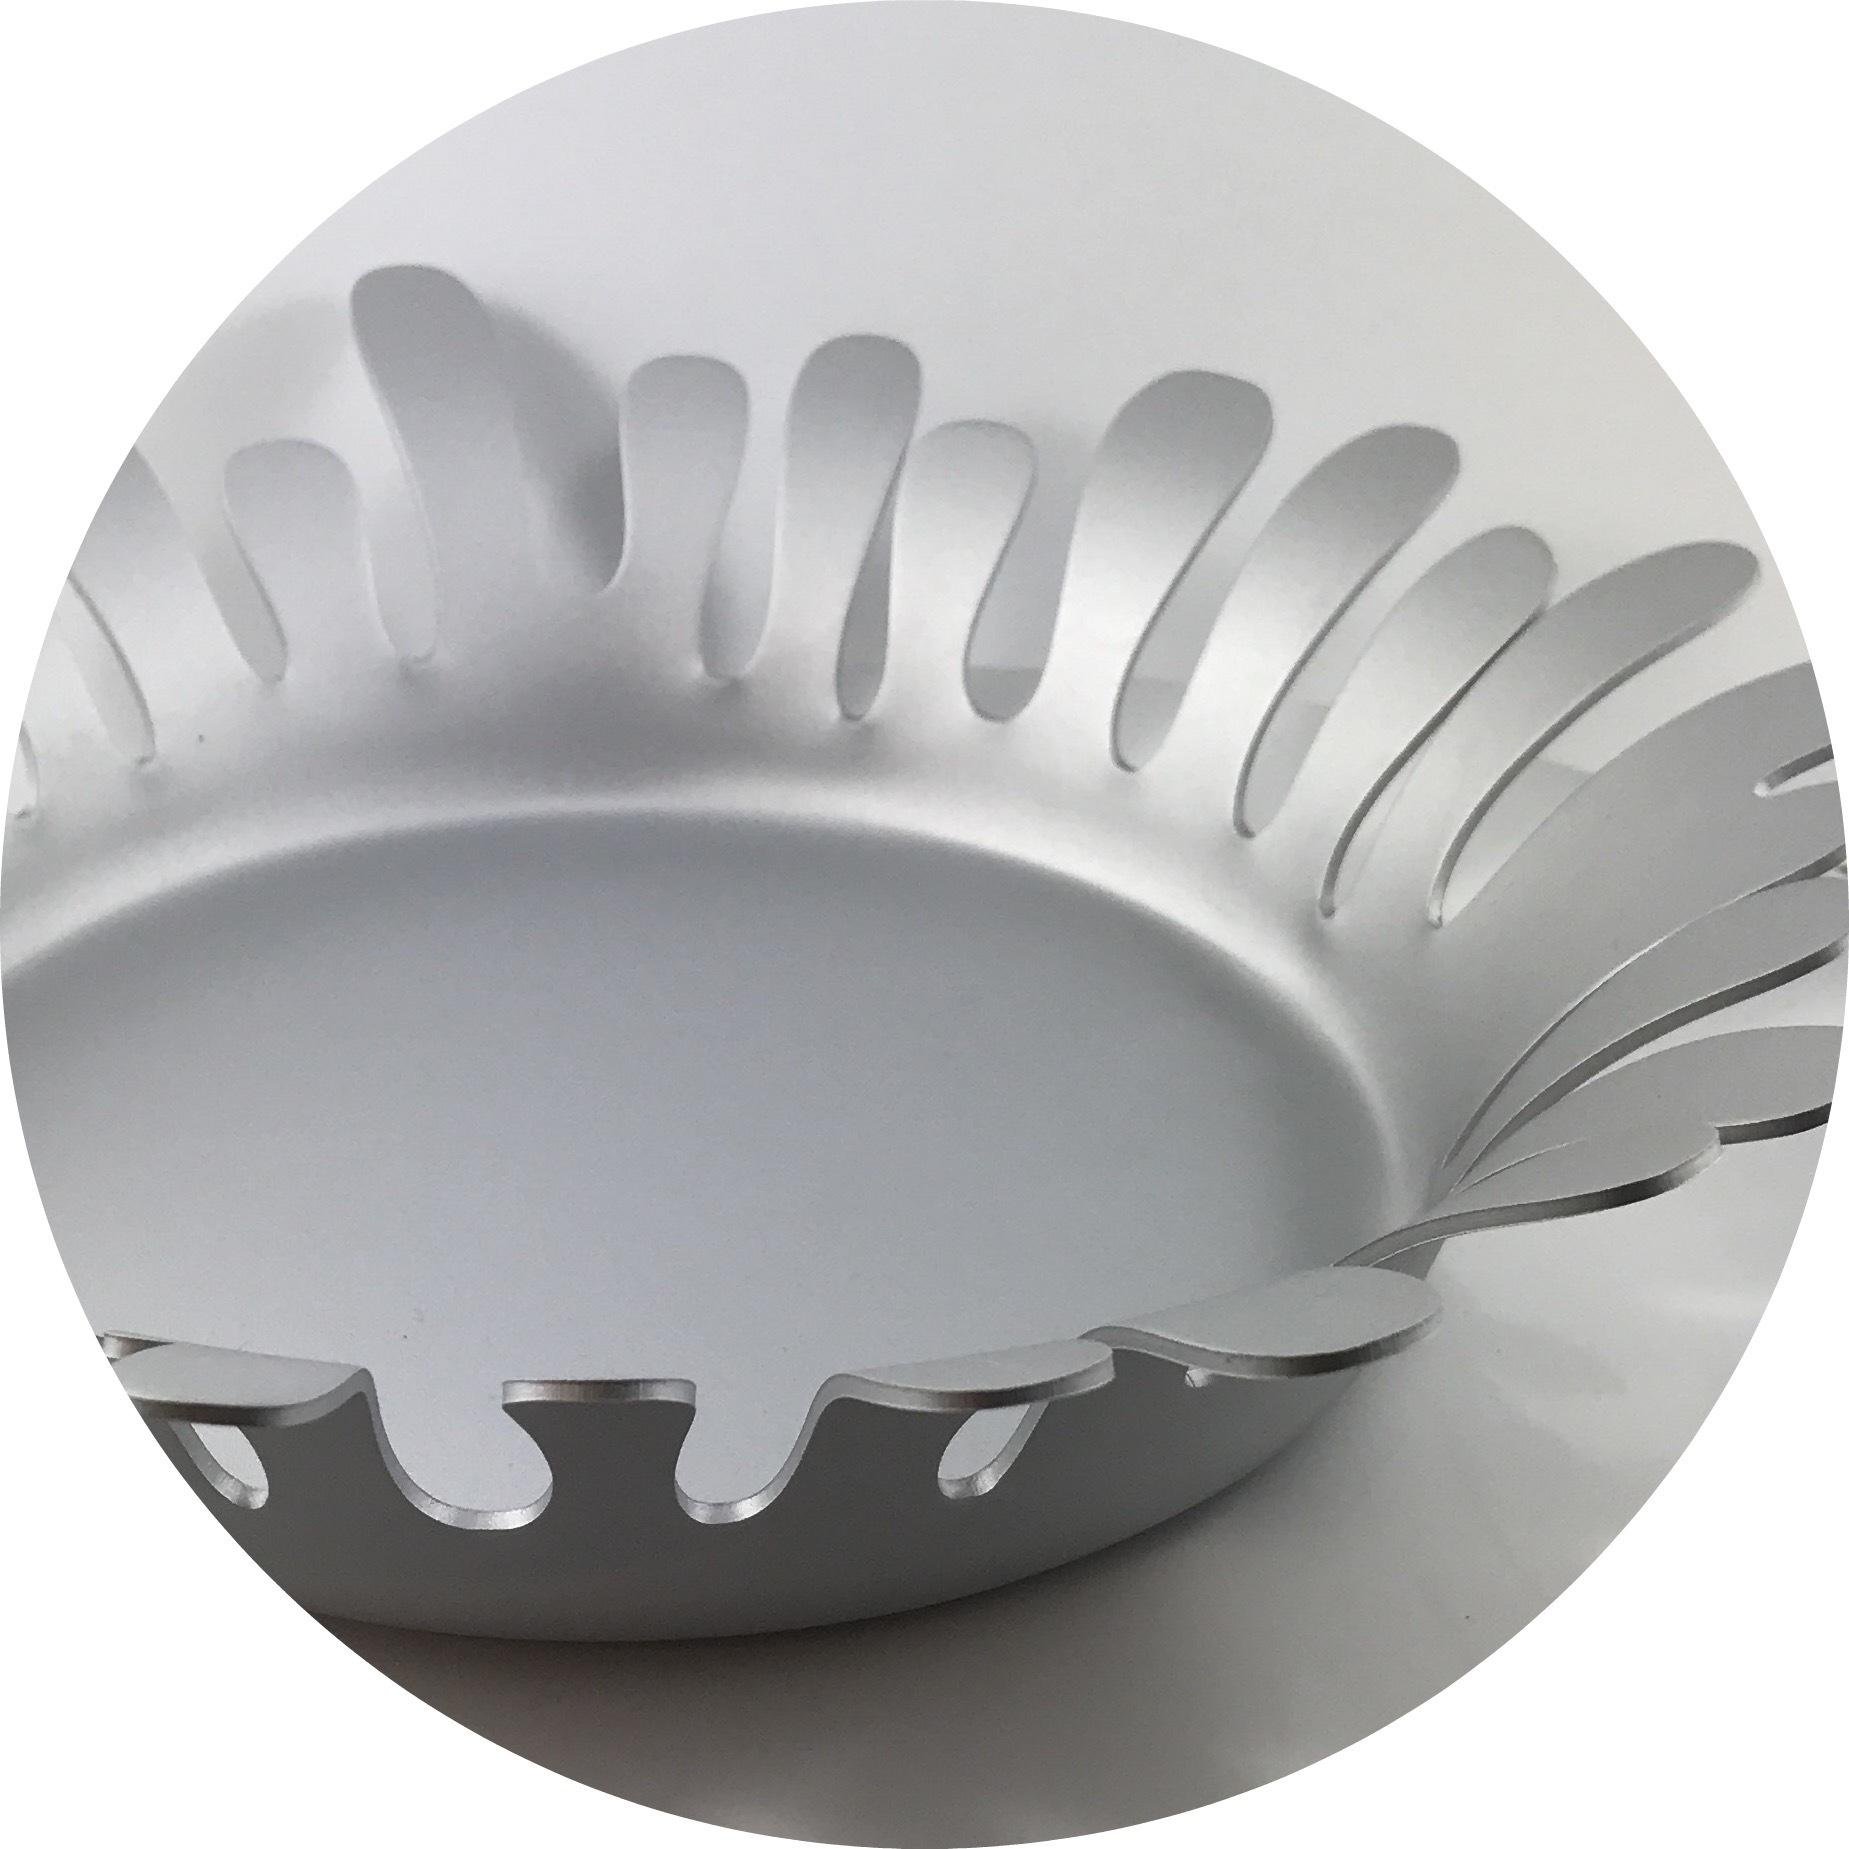 Steven Worthington - Anodized aluminium bowls